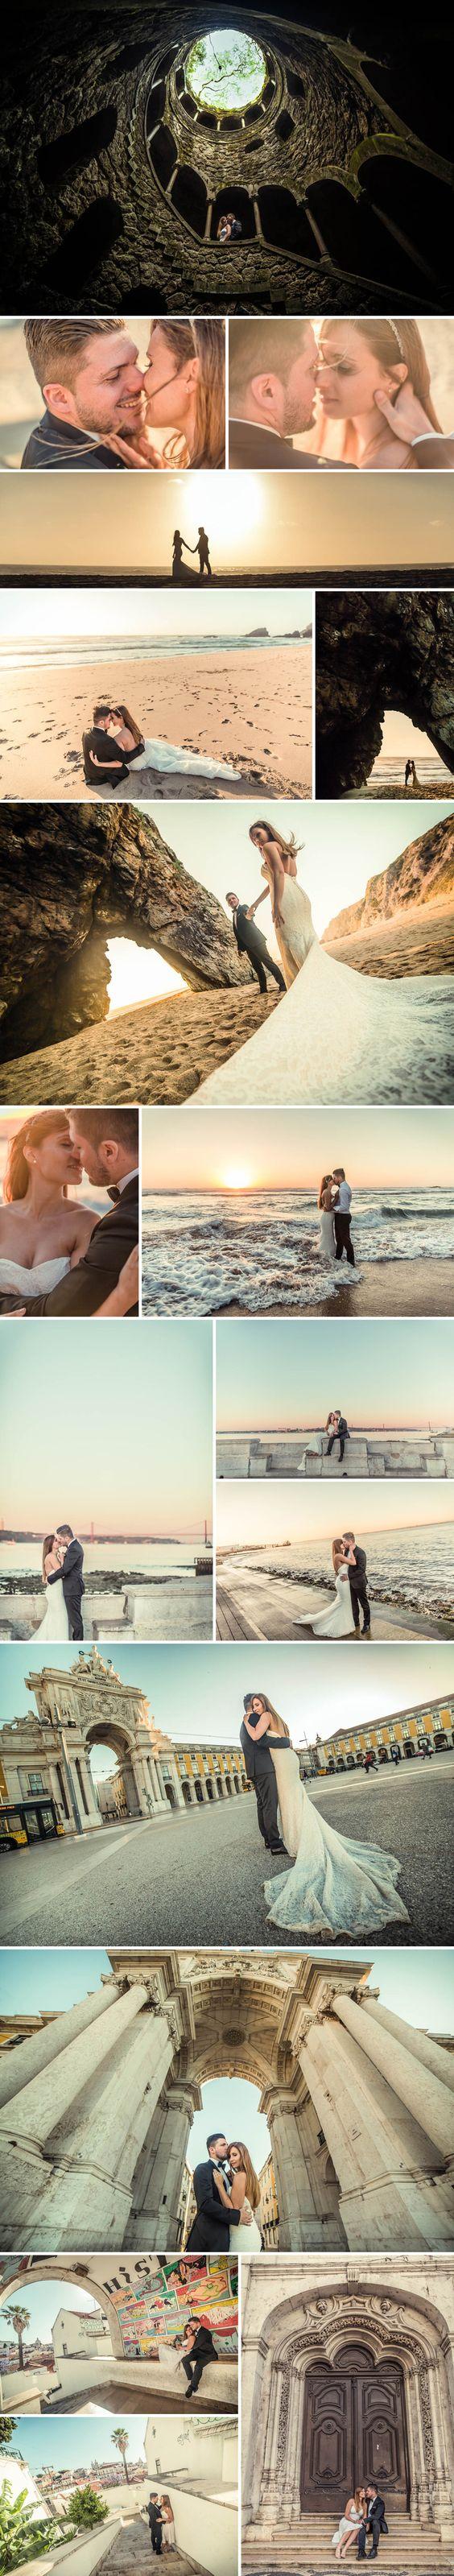 mariage wedding lisbonne lisboa portugal